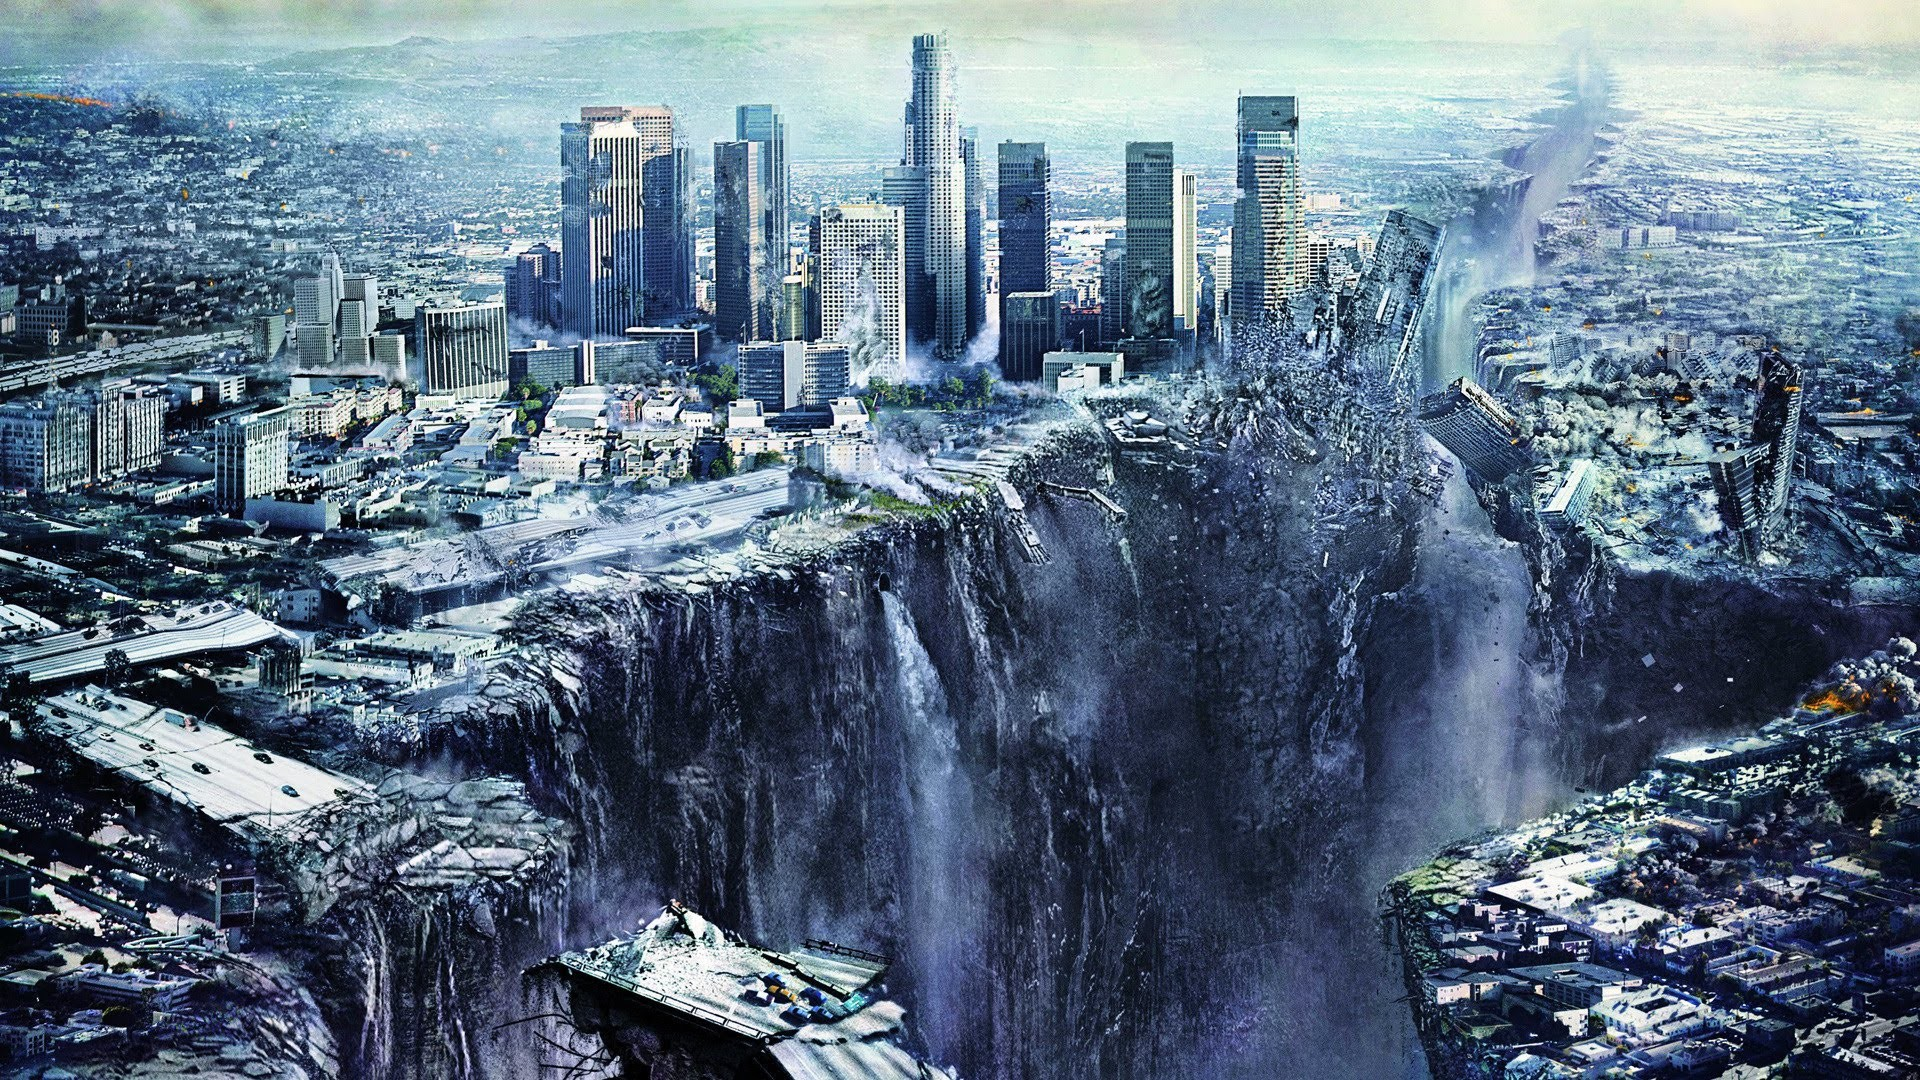 катастрофа, нибиру, конец света, человечество, армагеддон, земля